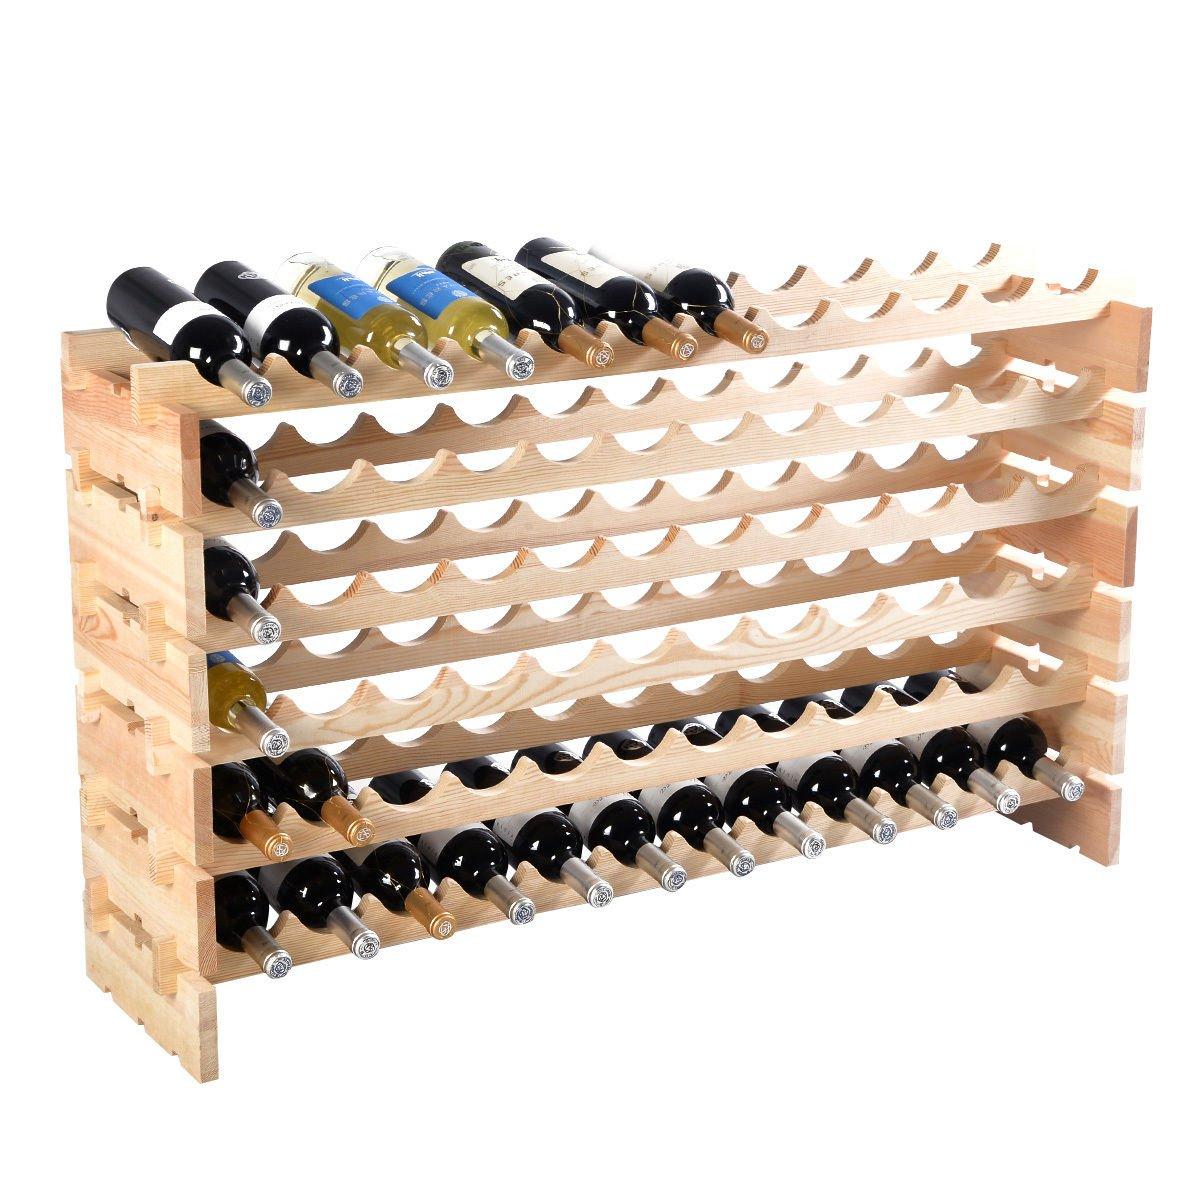 6 Tier Pinewood Wine Rack Natural Display Storage Shelves fit 72 Bottle by FDInspiration (Image #2)